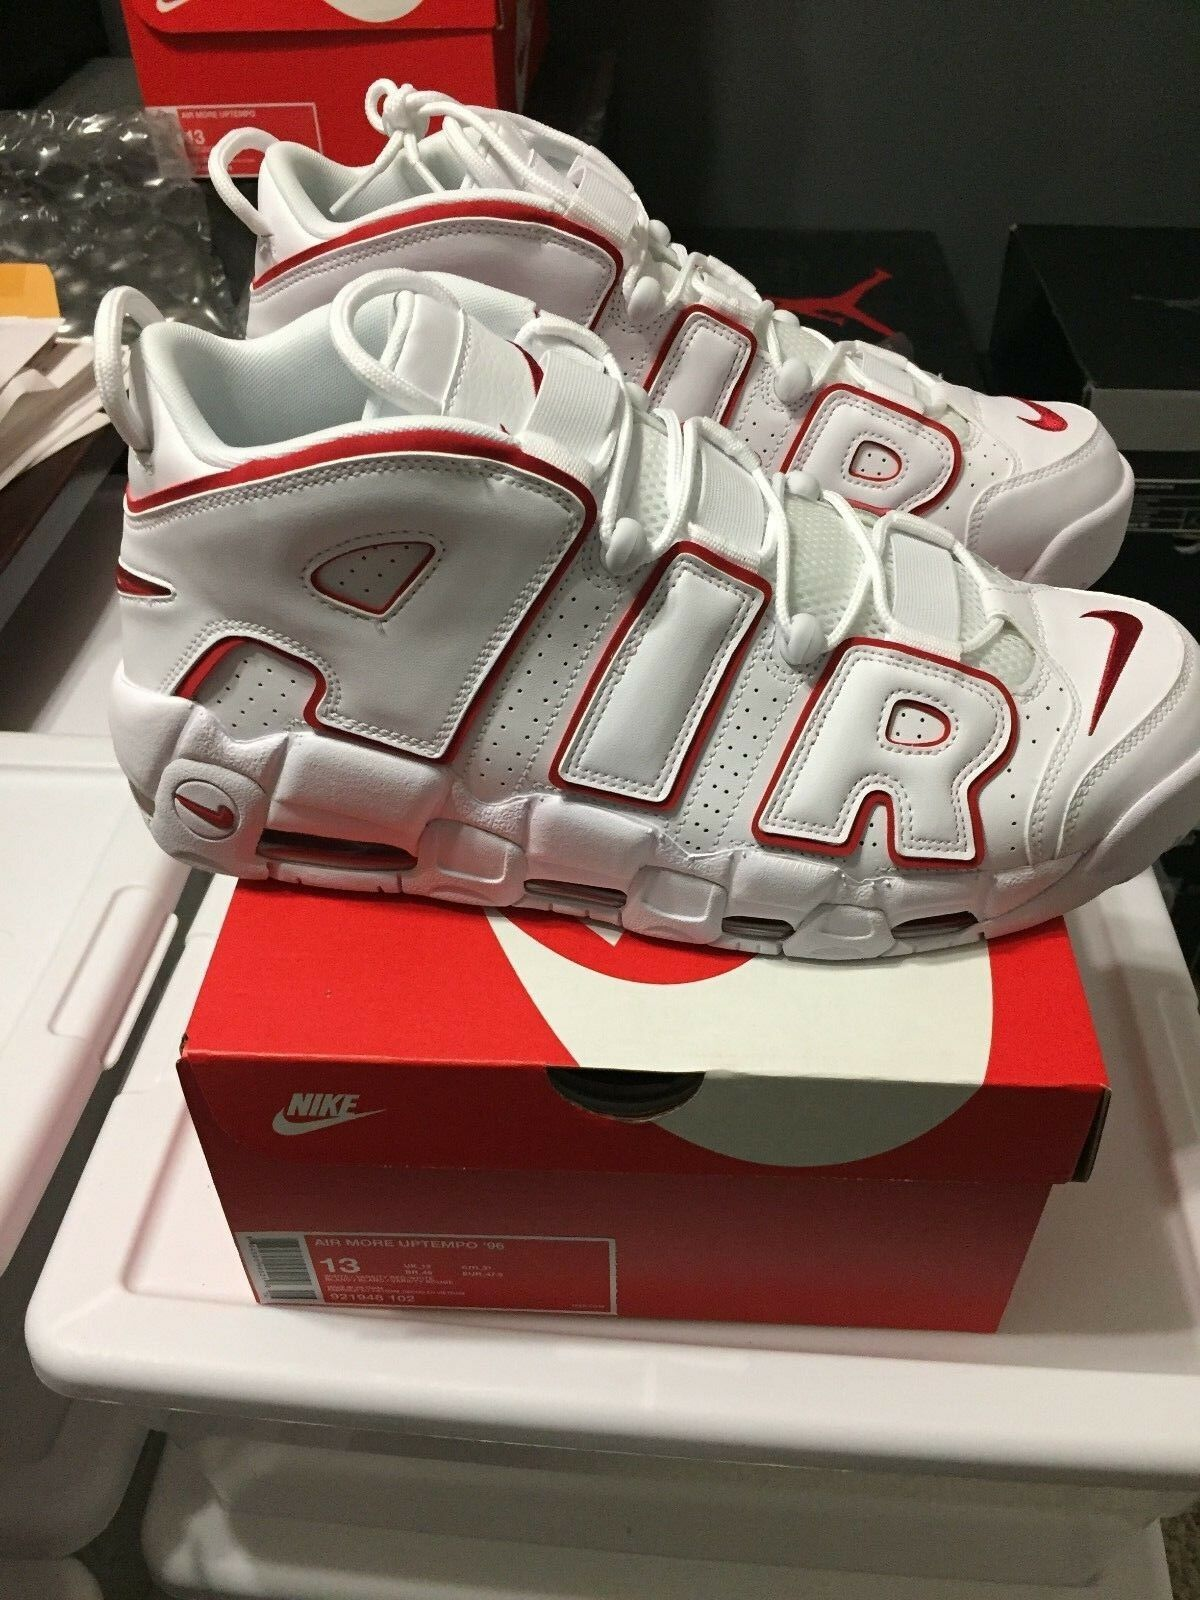 Nike Air more Uptempo '96 Blanco Tamaño Varsity Rojo Pippen Hombre Tamaño Blanco material fe841c